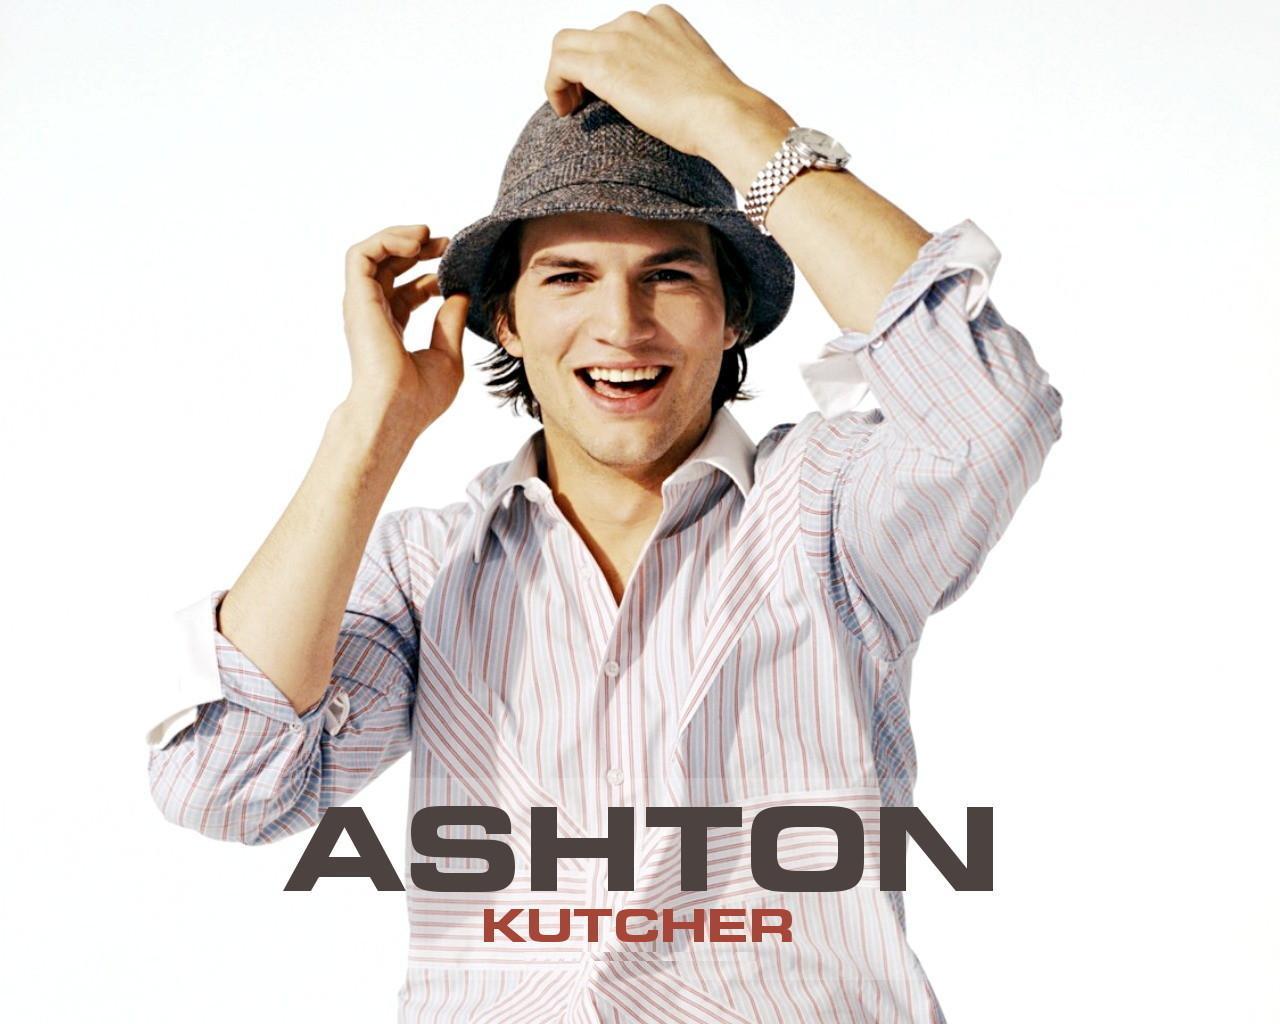 http://4.bp.blogspot.com/_GxPqfHOuYyc/TAcqZfDV4BI/AAAAAAAAB00/z2OO6STIWlM/s1600/Ashton-ashton-kutcher-3325028-1280-1024.jpg